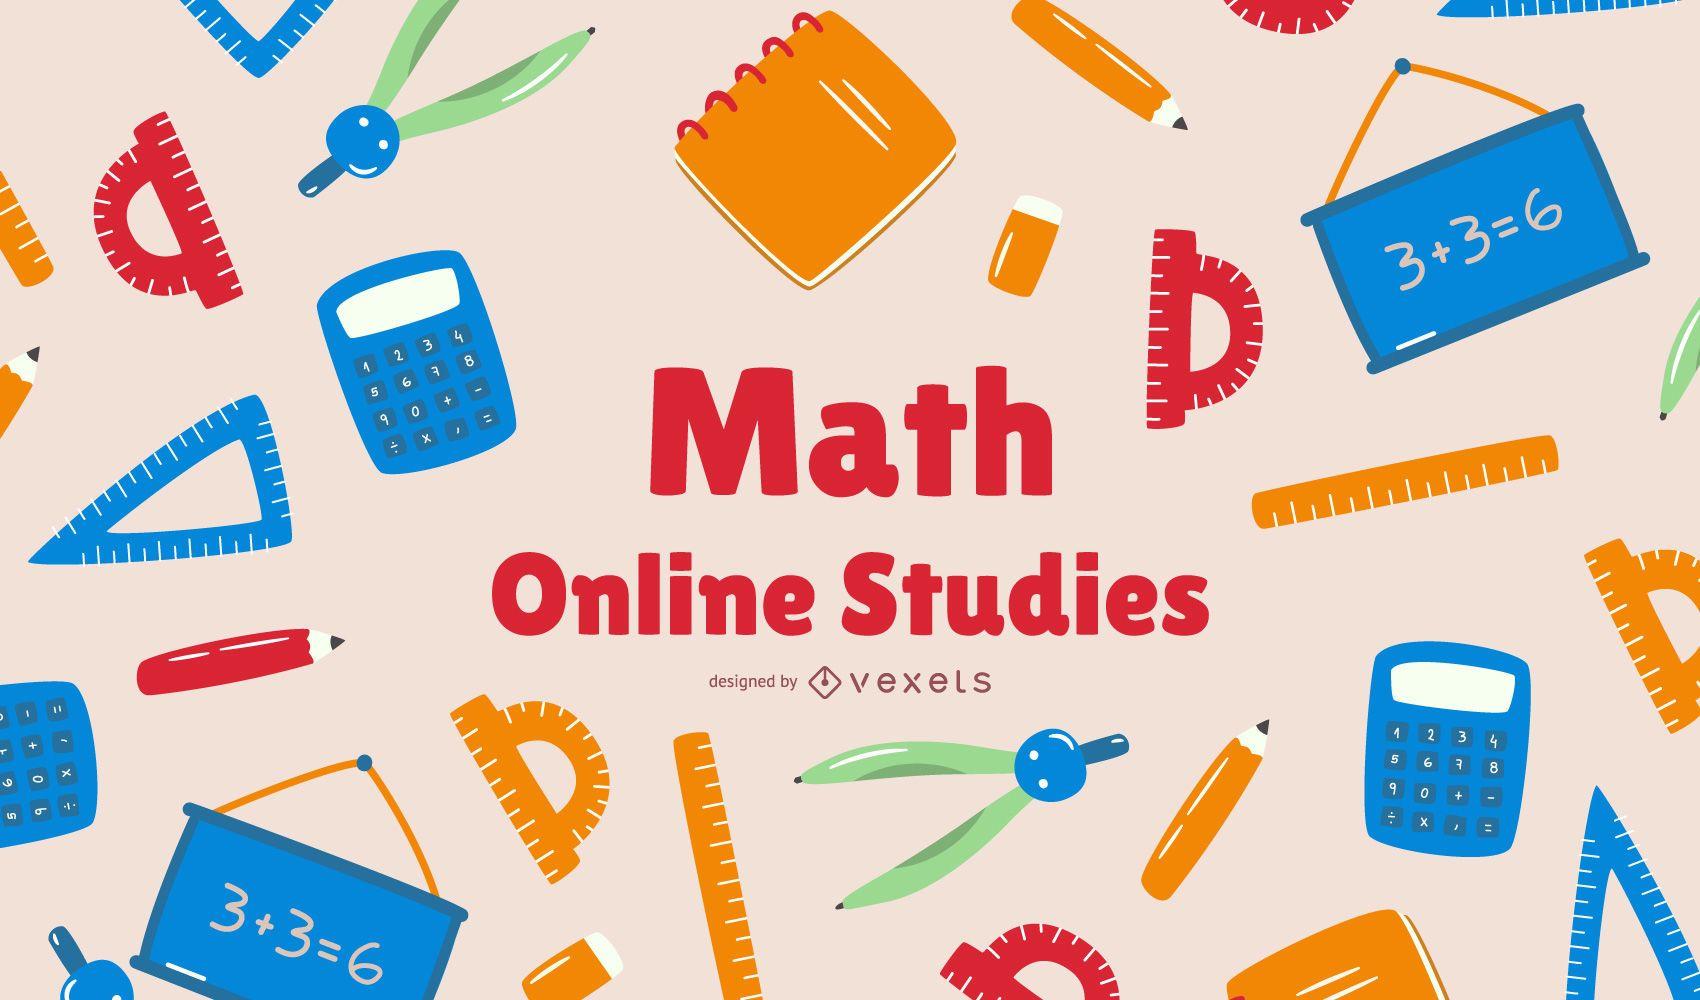 Math Online Studies Cover Design